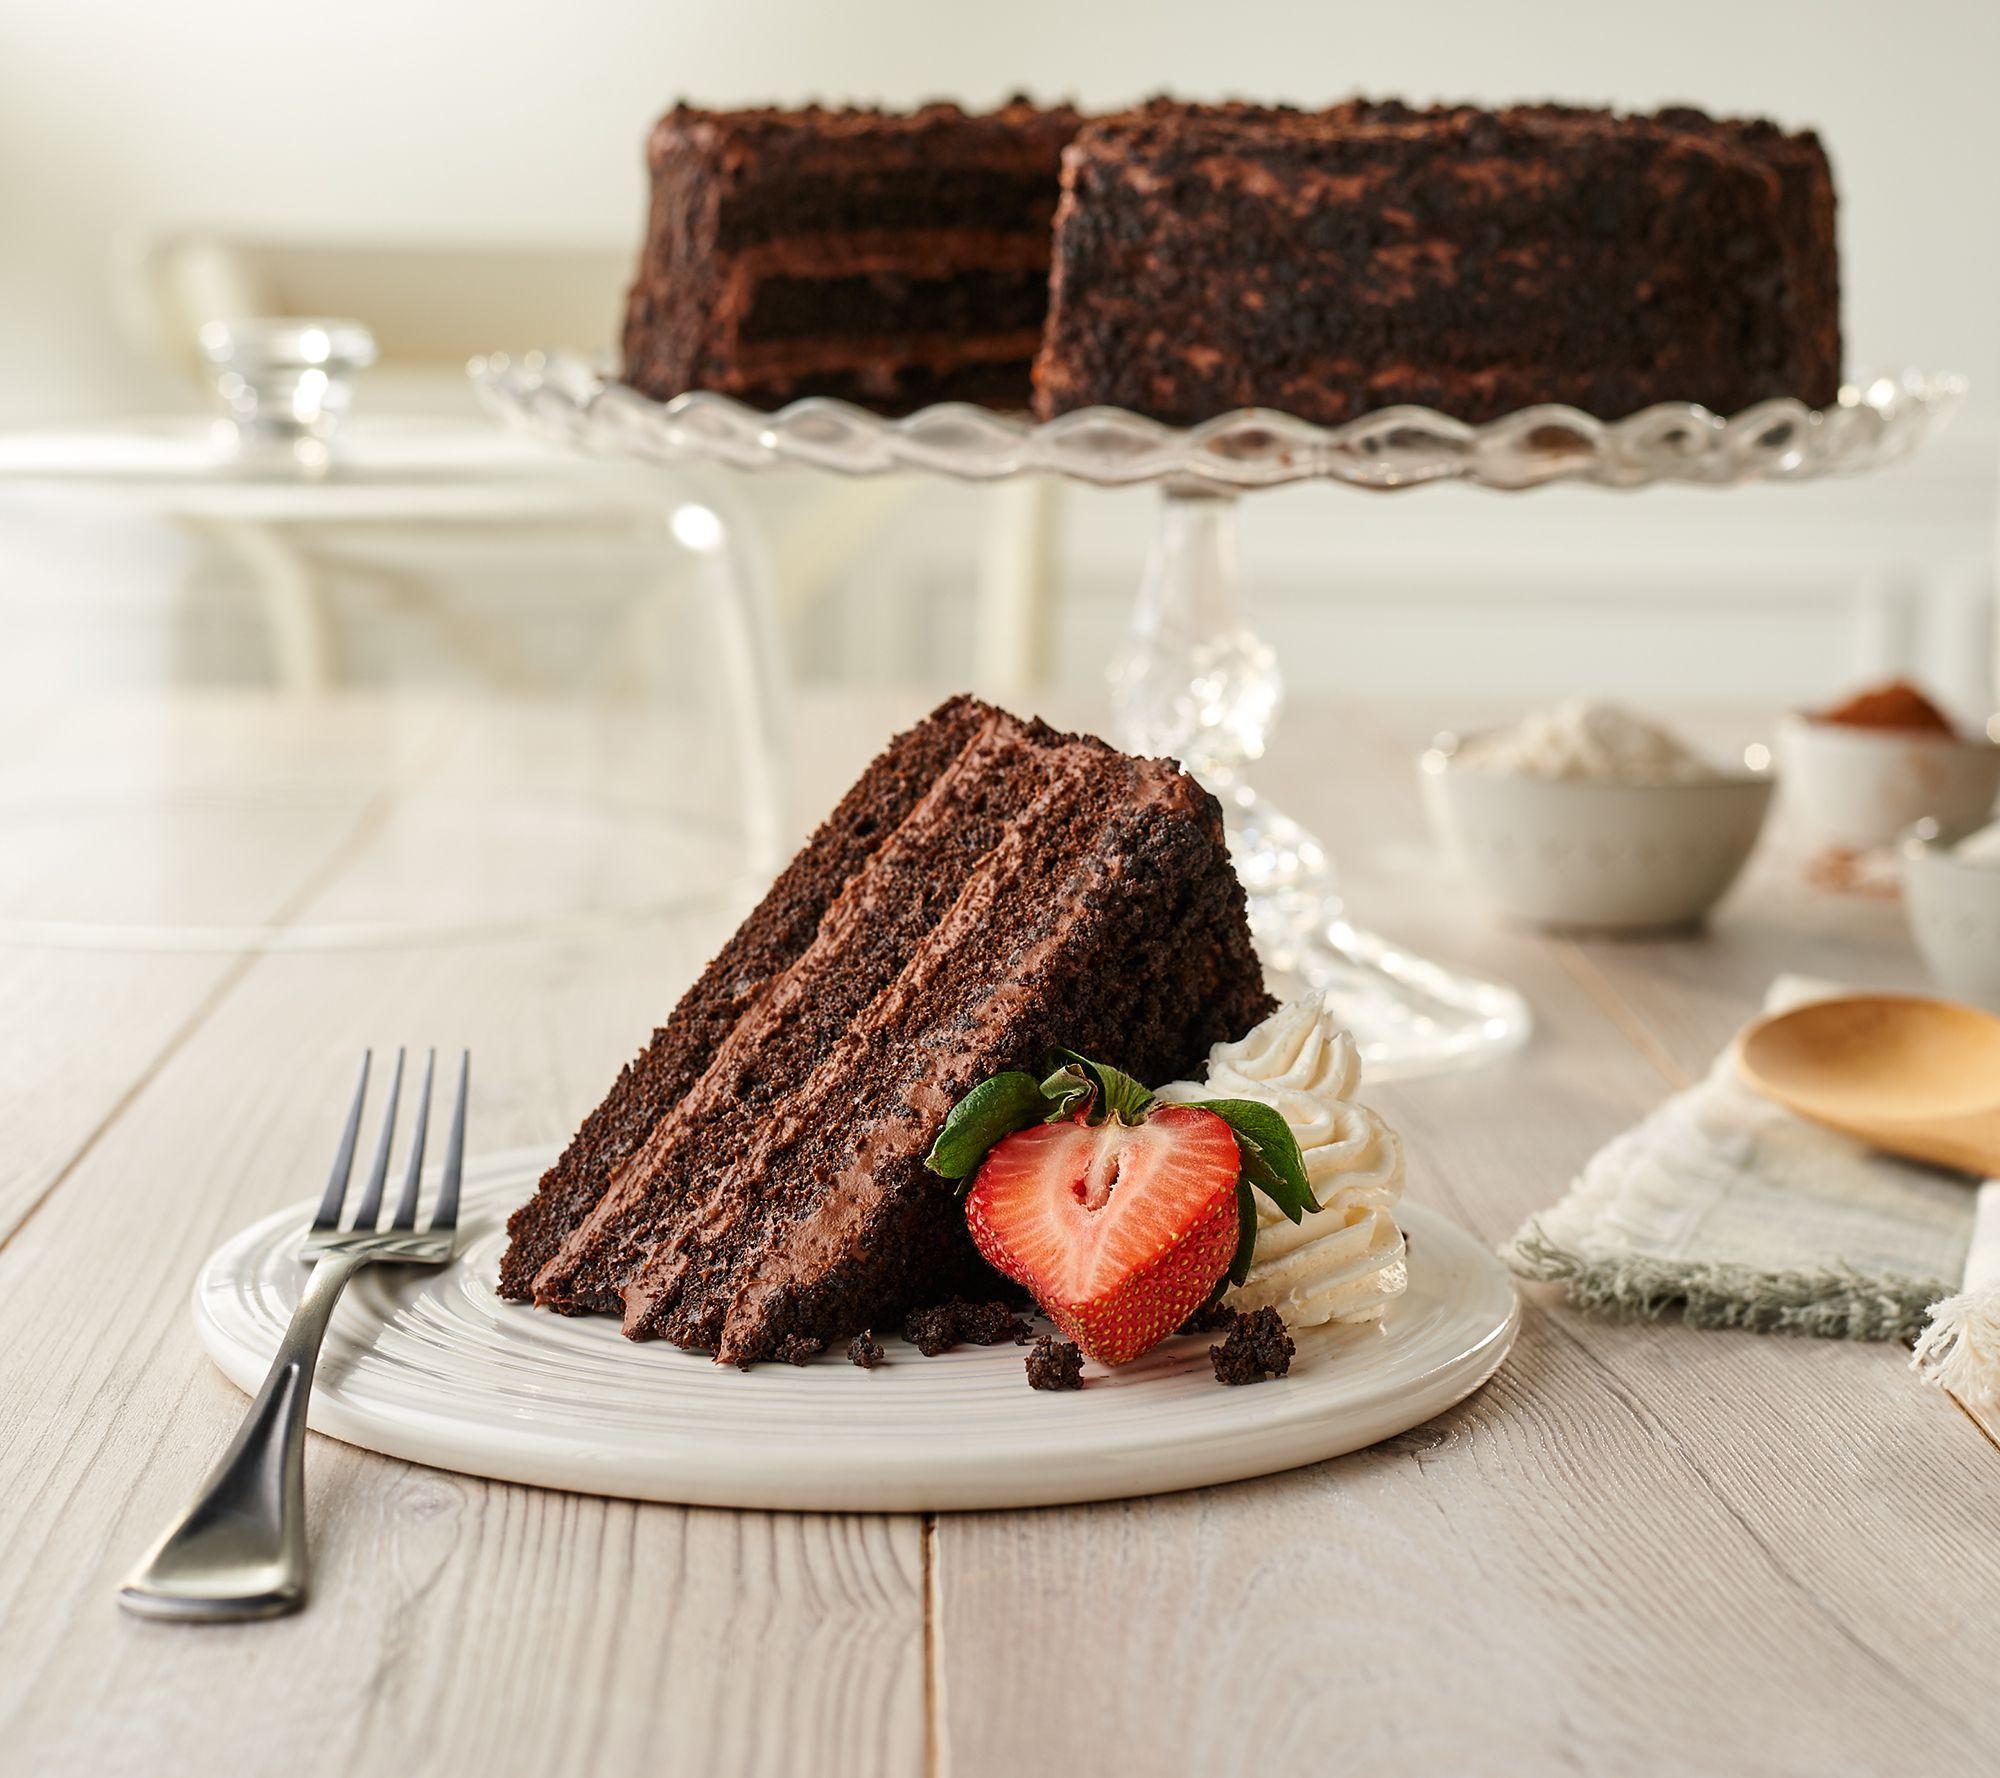 900a01e5b24ca Junior s 5-lb Brooklyn Blackout Layer Cake - Page 1 — QVC.com